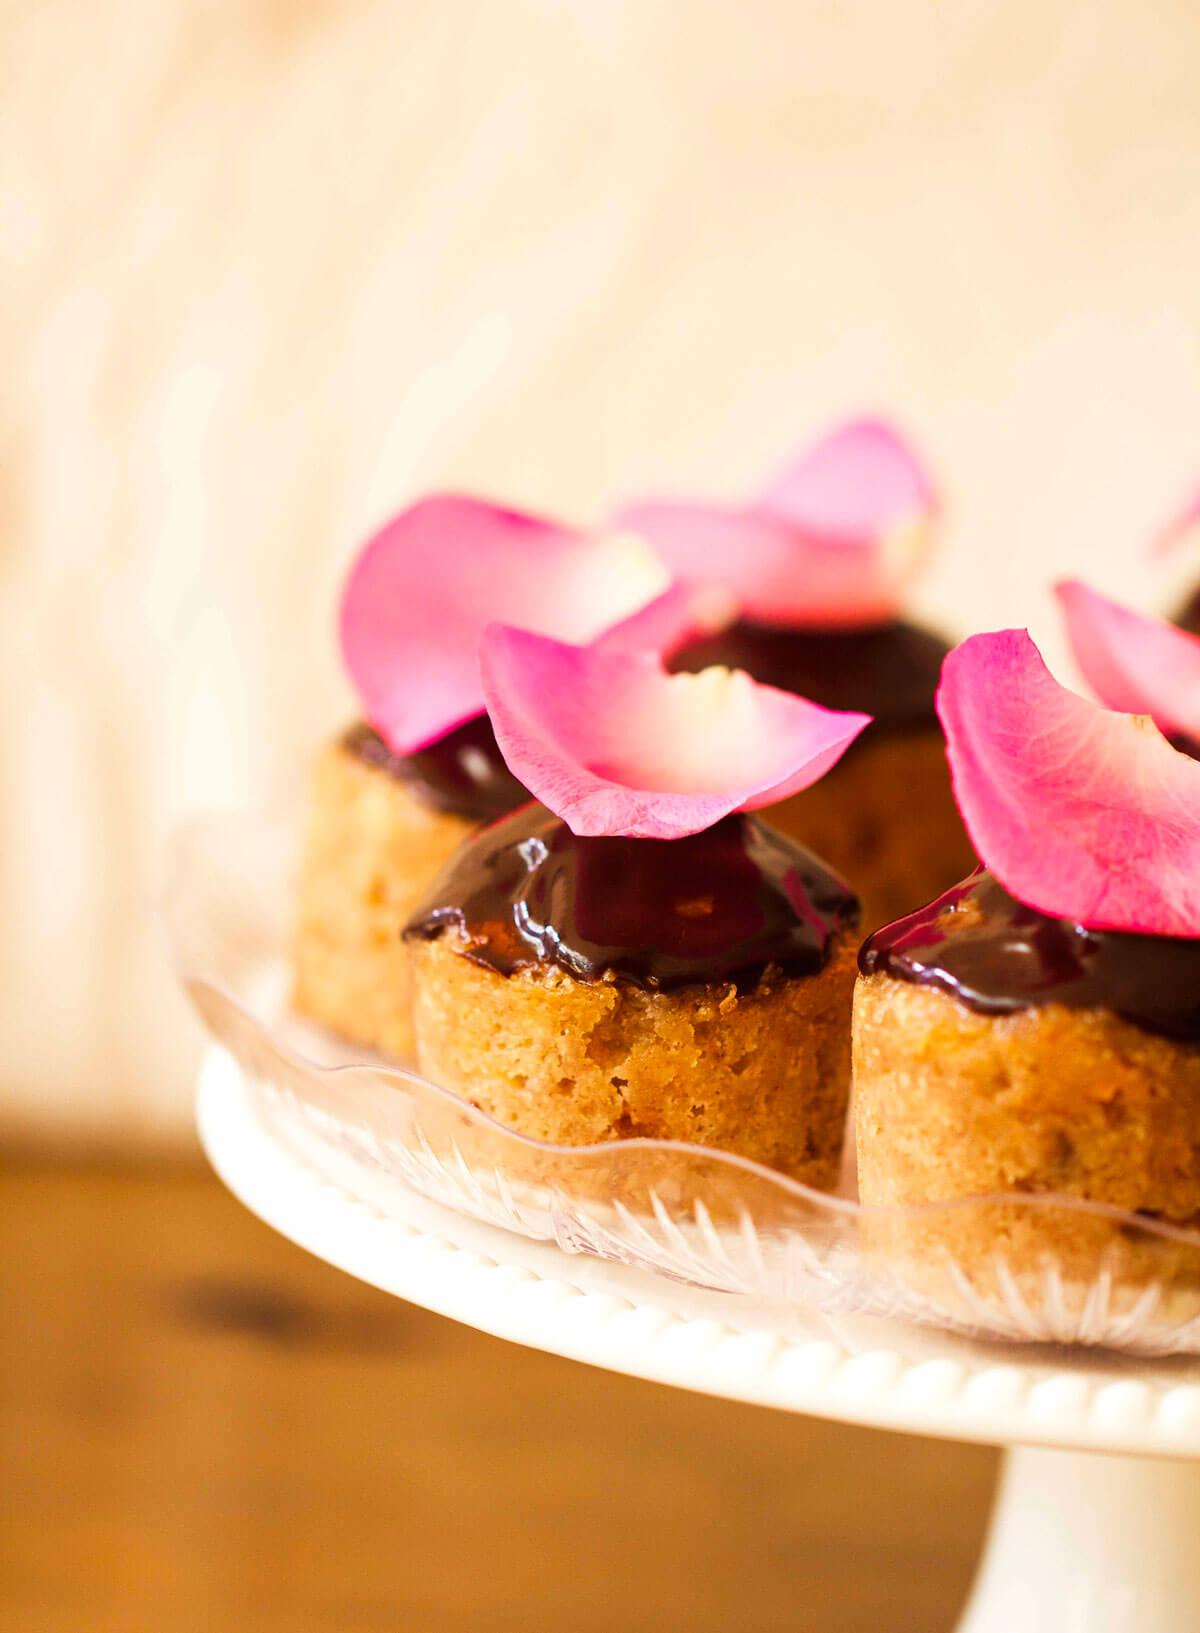 Banana Cinnamon Cupcakes with Mocha Icing